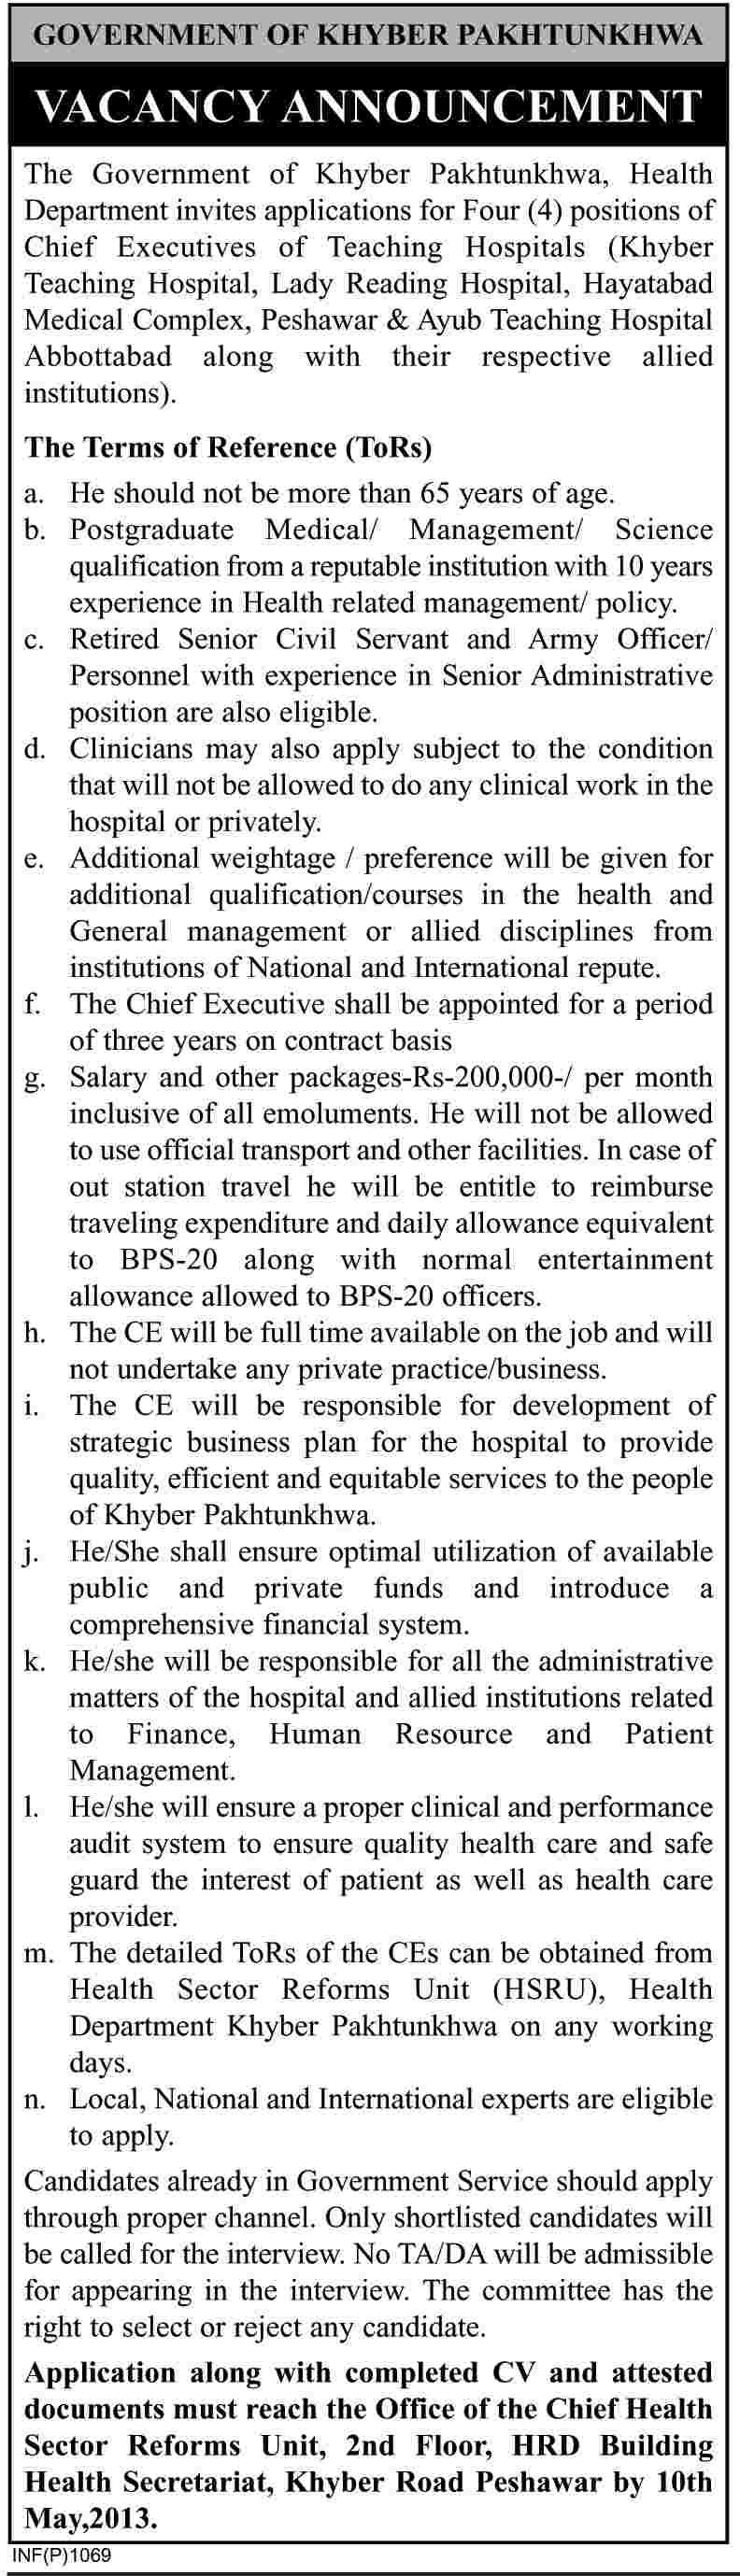 Jobs for Cheif Executives of Teaching Hospital in Govt. of KPK